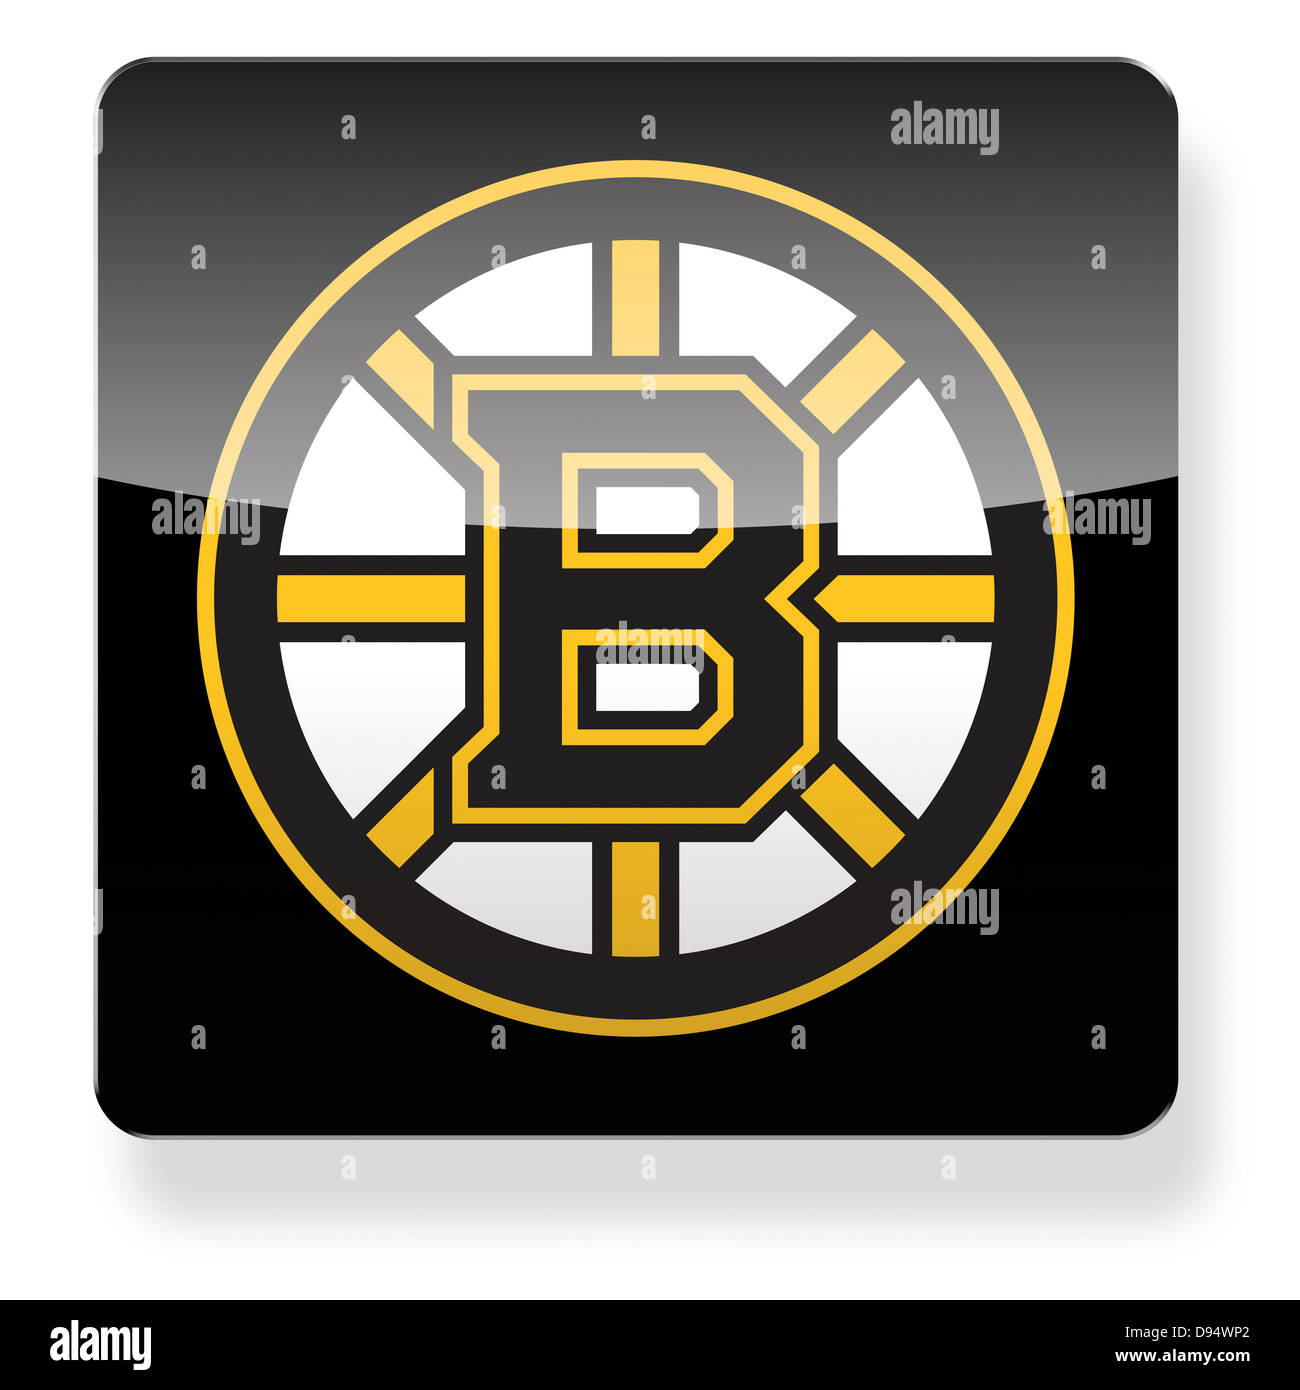 34e9a1ab17f Boston Bruins hockey team logo as an app icon. Clipping path Stock ...